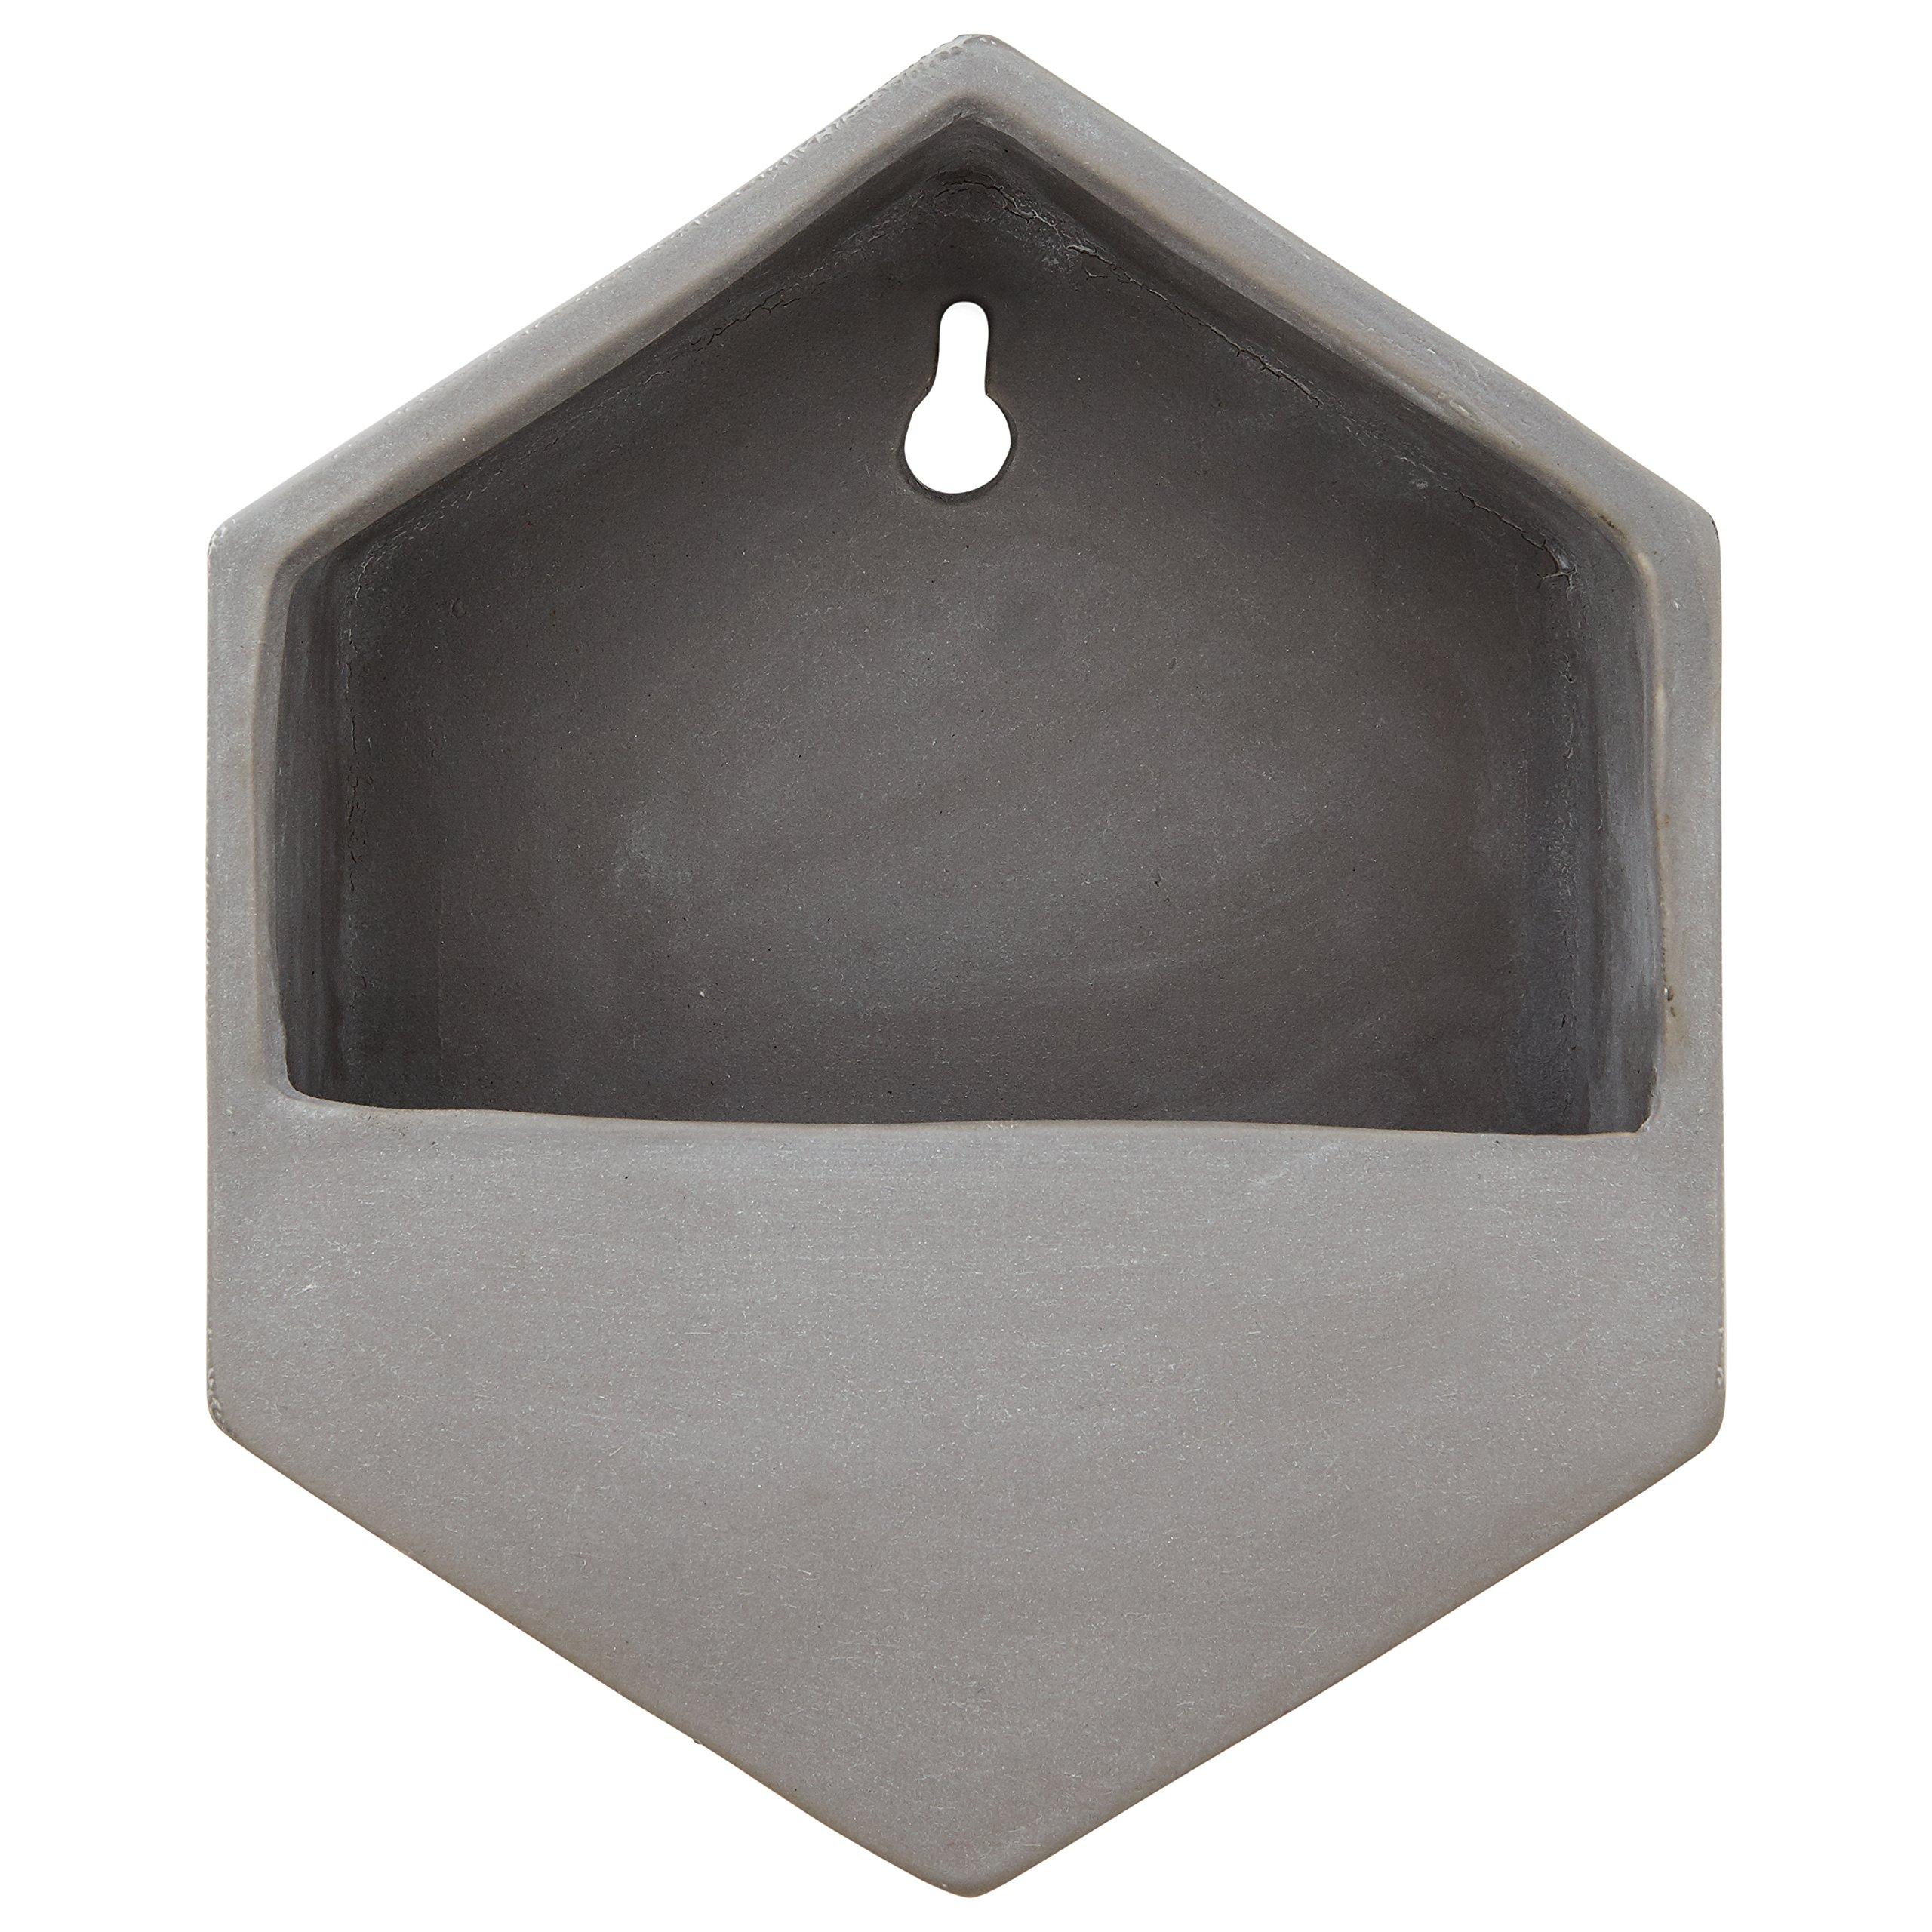 Rivet Modern Hexagonal Earthenware Wall Mount